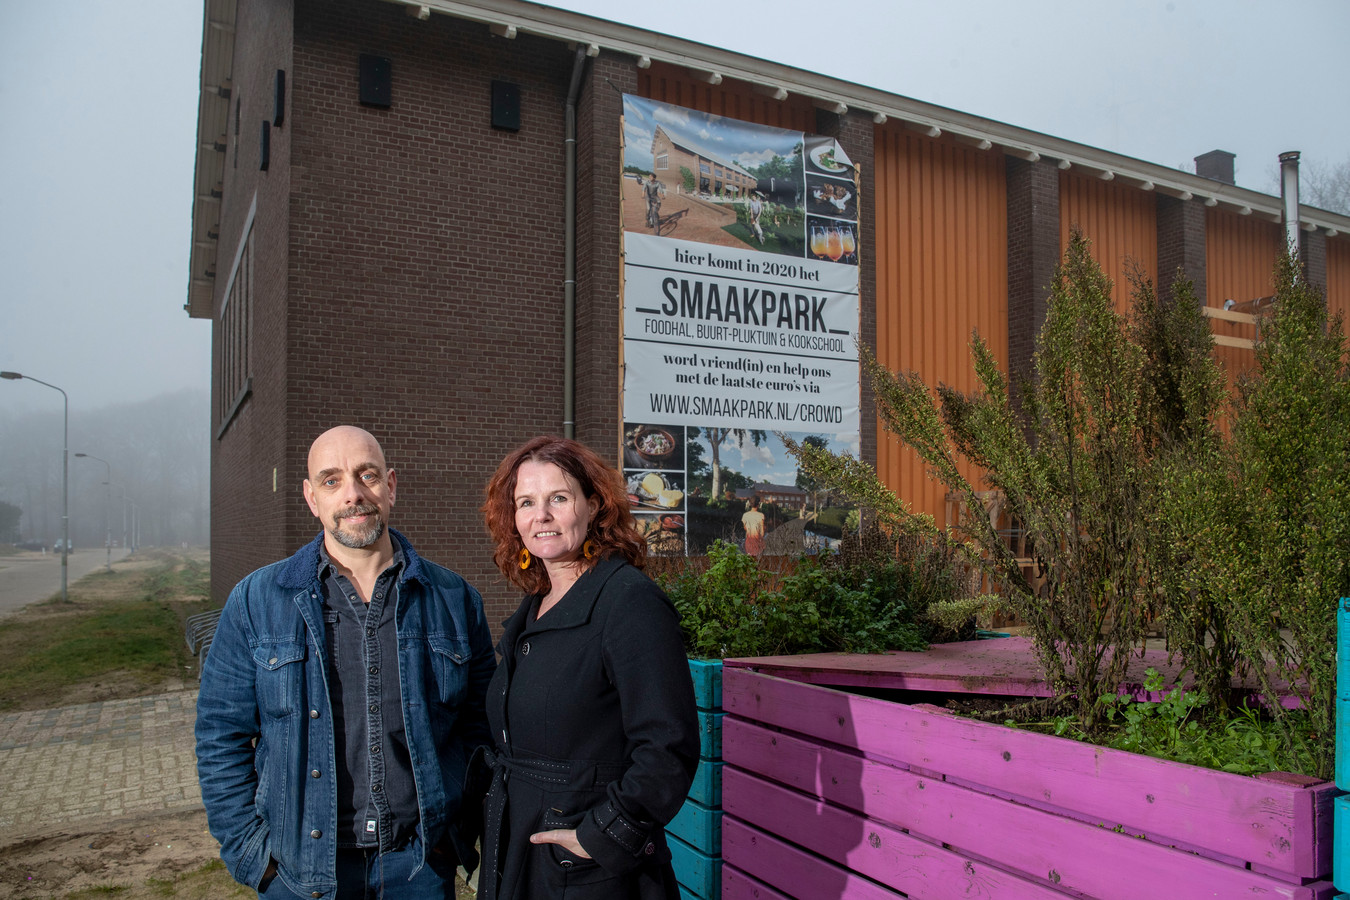 Christiaan Weij en Petra Busser op de plek in Ede waar hun Smaakpark zal komen.